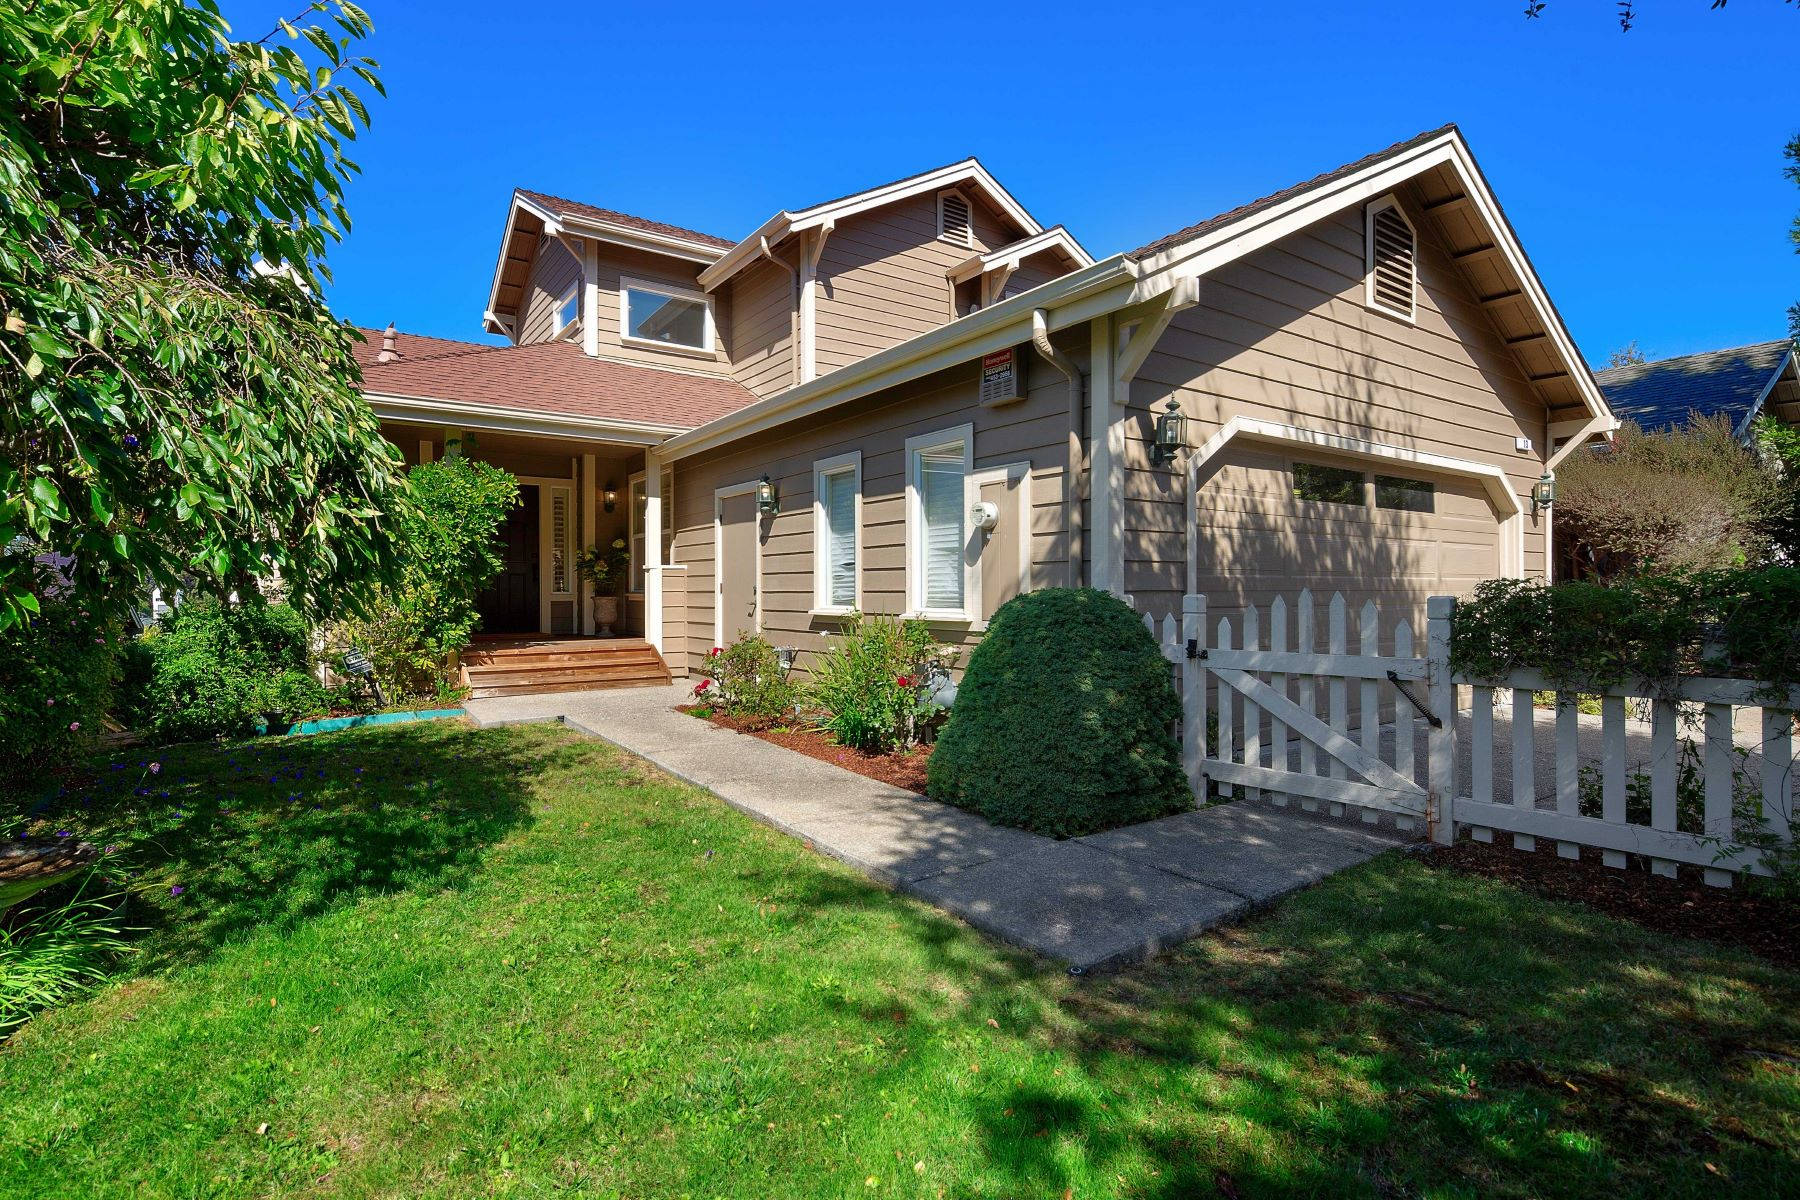 Single Family Homes for Sale at Popular Madera Del Presidio Neighborhood! 13 Presidio Court Corte Madera, California 94925 United States